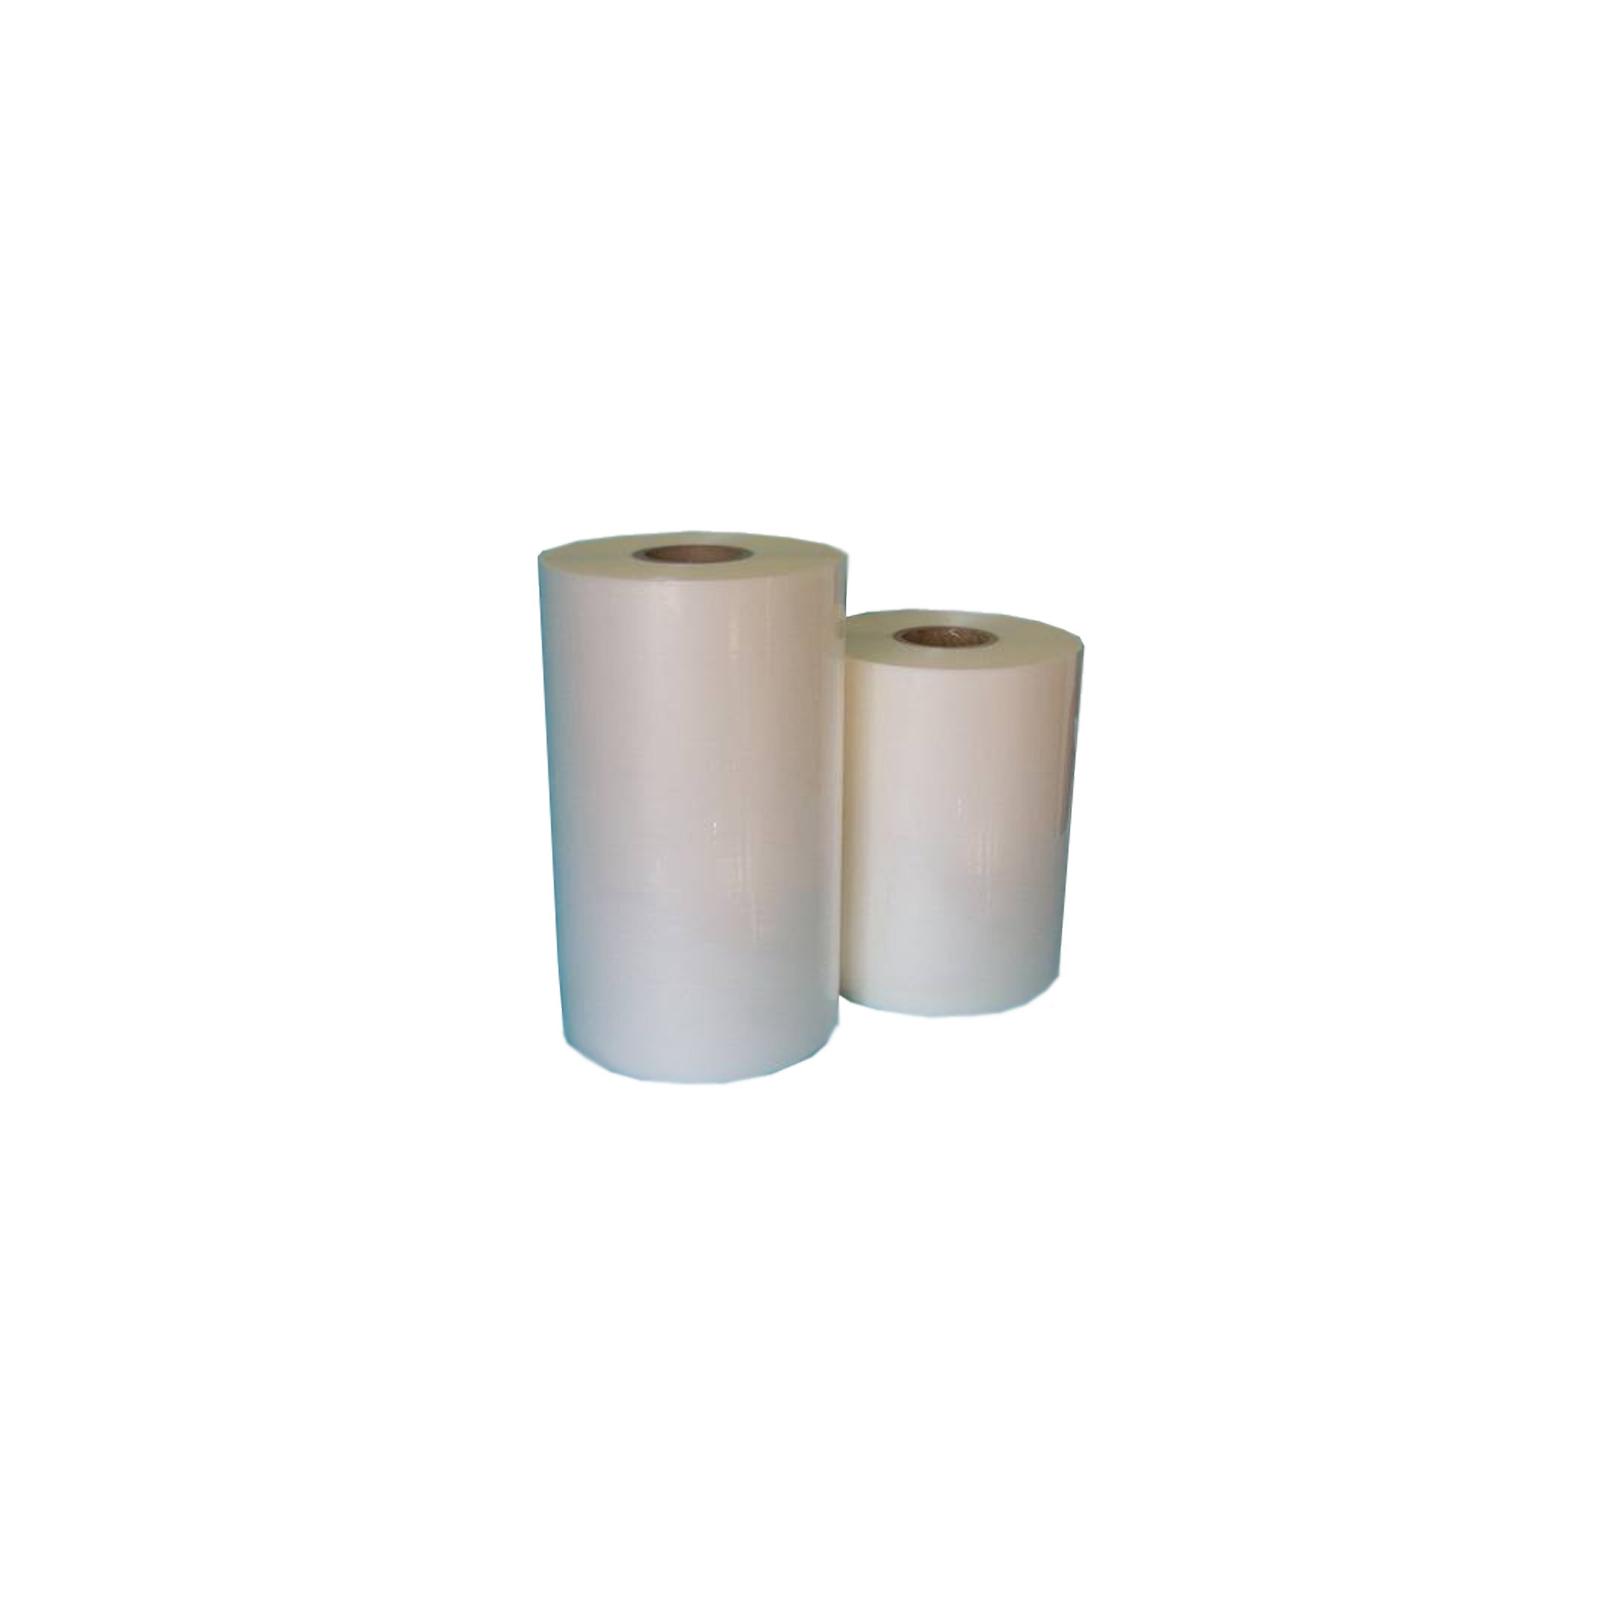 Пленка для ламинирования рулонная PKC Soft-Velvet 450 мм, 1000 м, 38 мкн (51074)